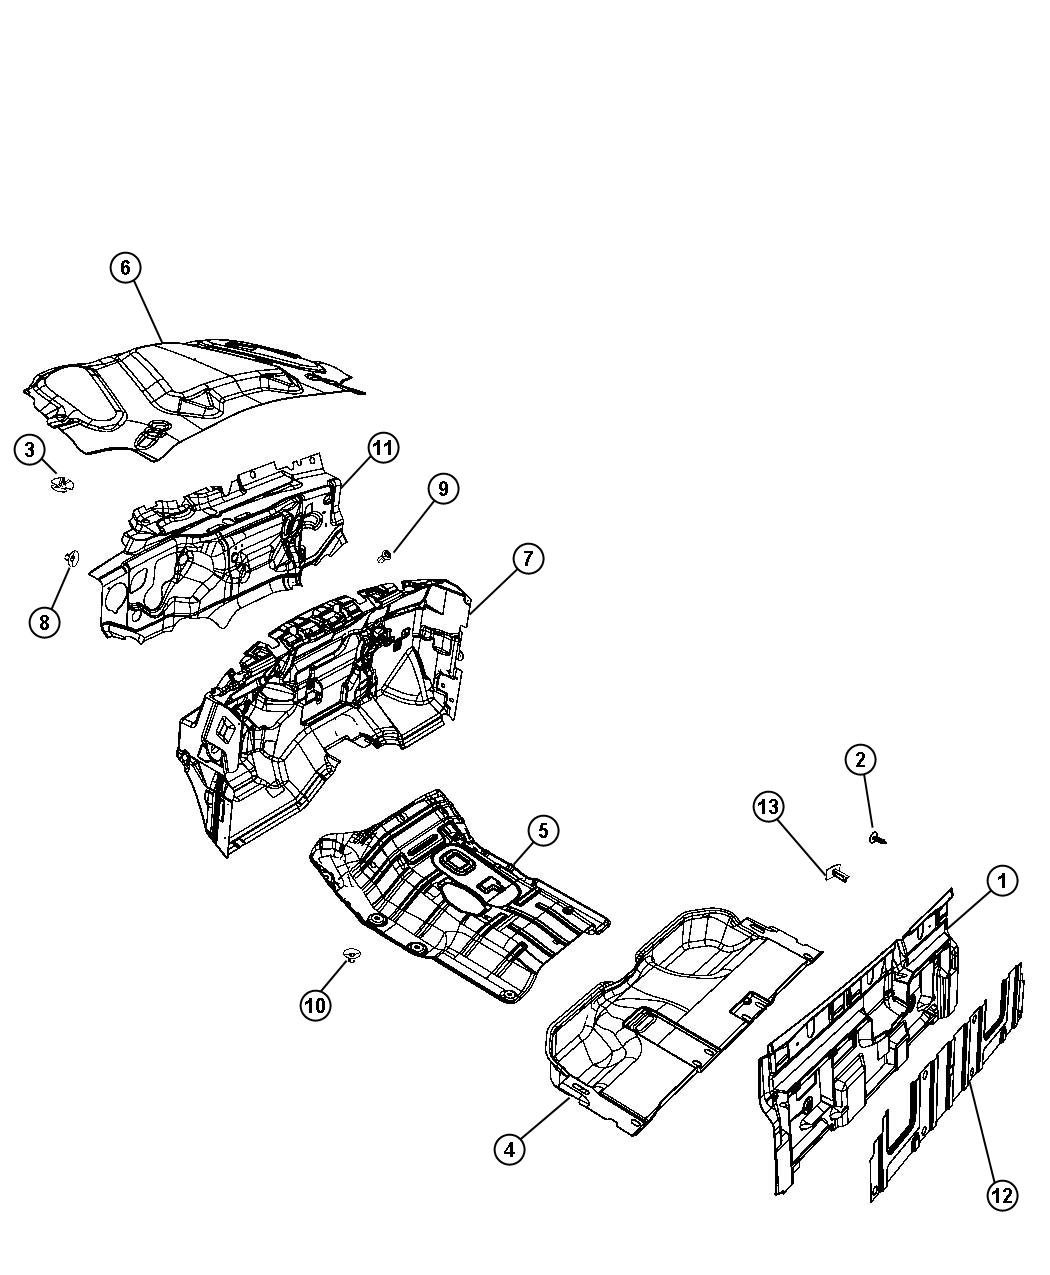 [DIAGRAM] Dodge Ram Wire Color Codes Under Hood Fuse Box